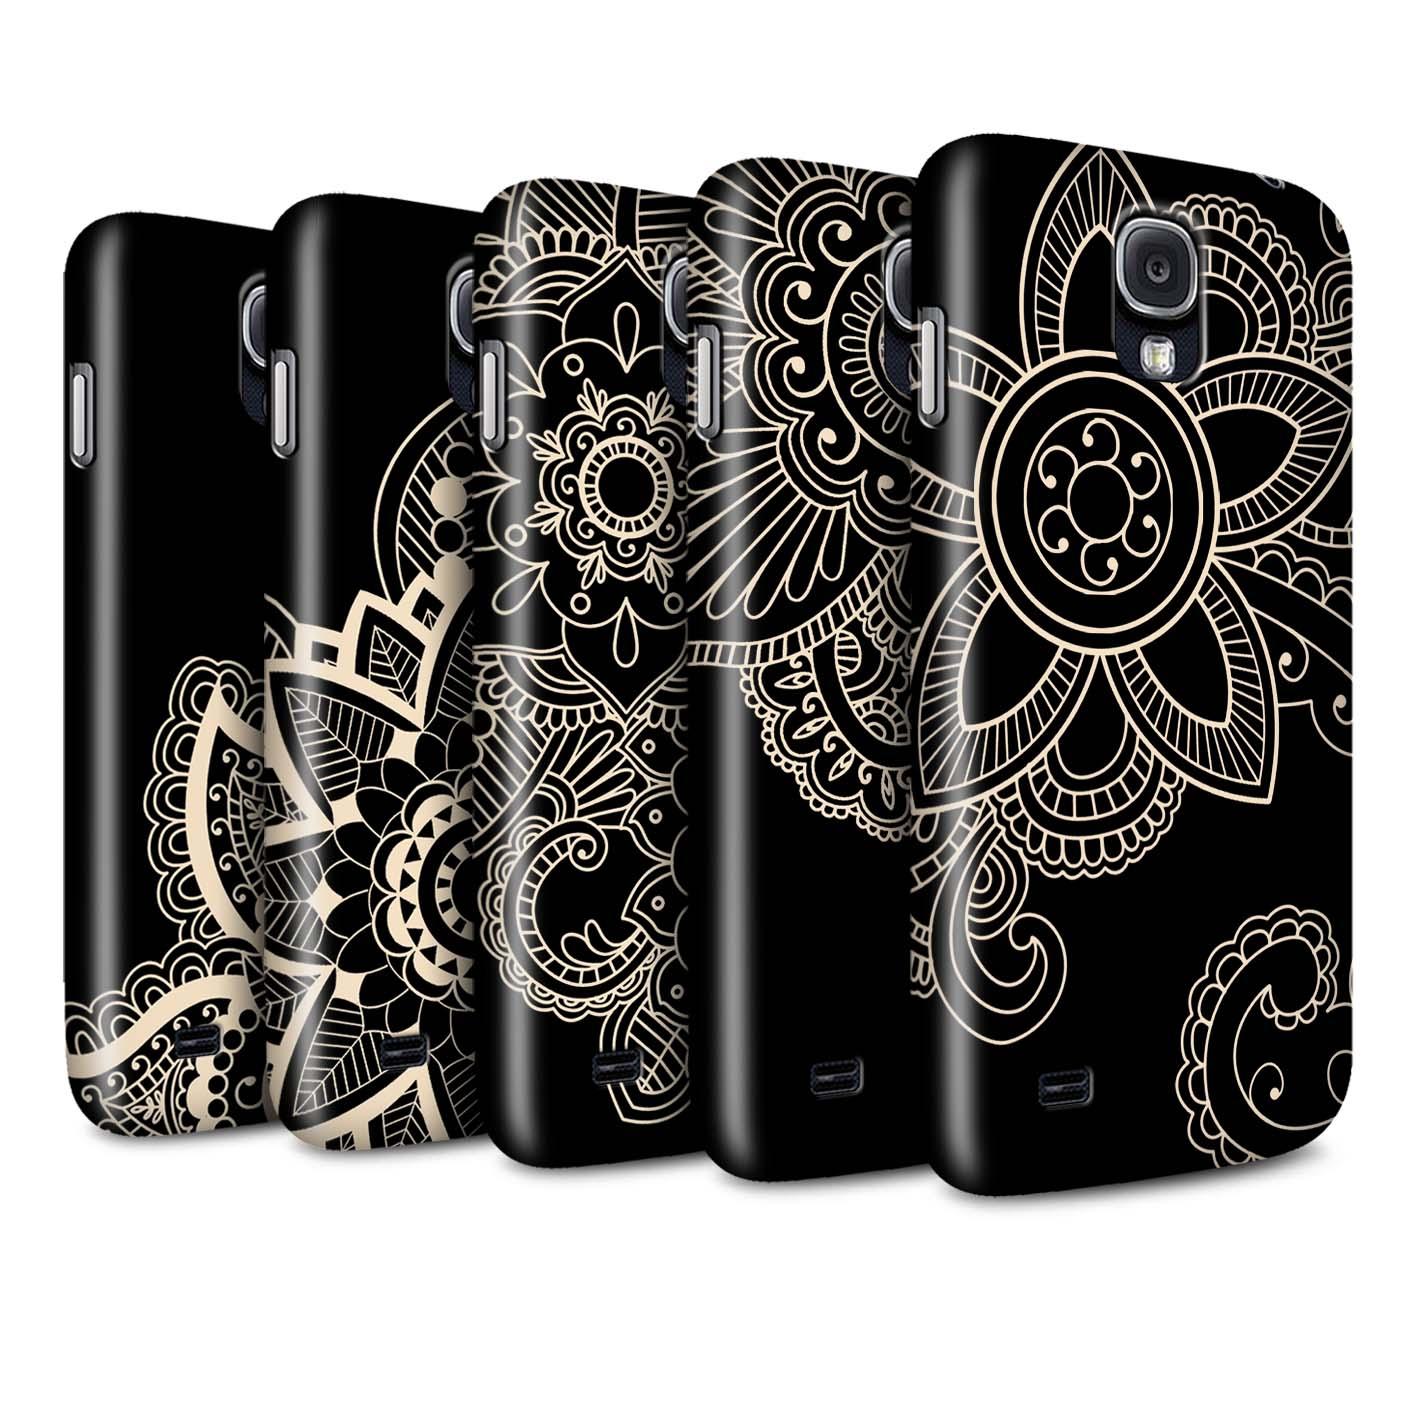 STUFF4-Matte-Phone-Case-for-Samsung-Galaxy-S4-SIV-Henna-Tattoo